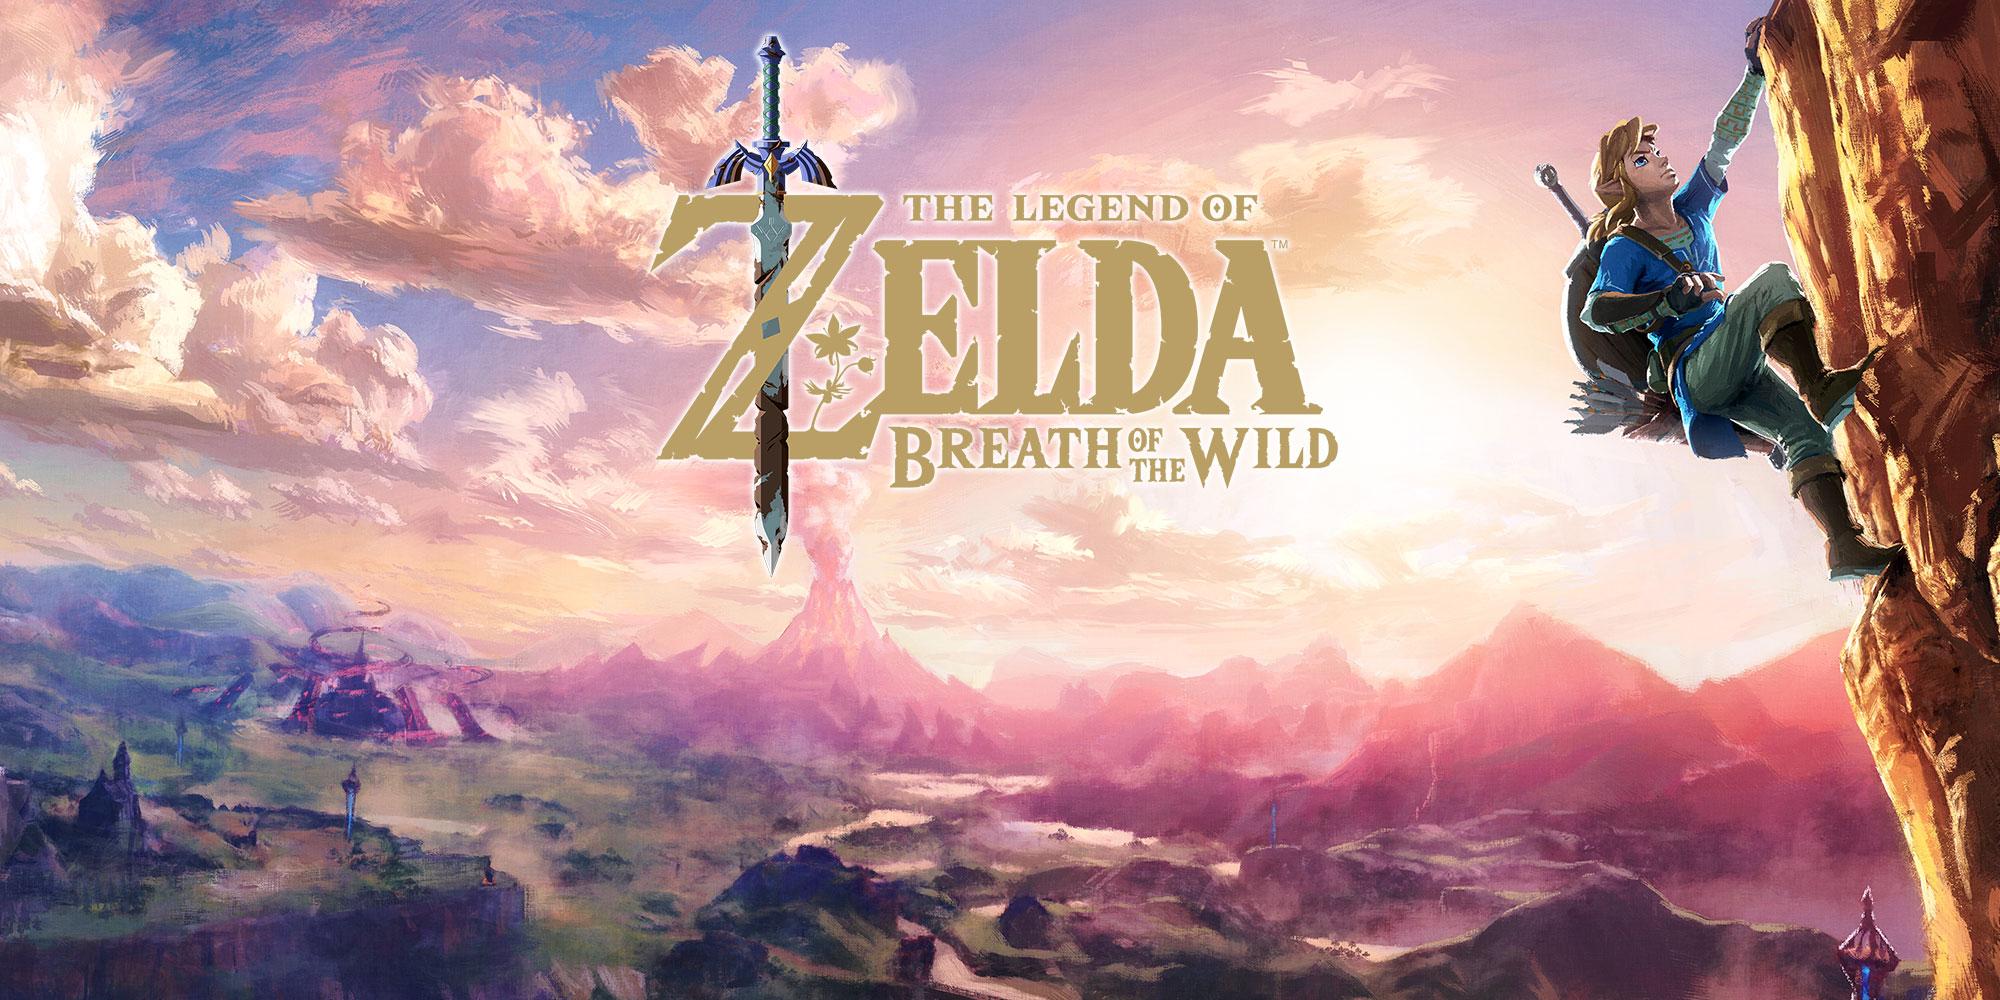 塞尔达传说:荒野之息(The Legend of Zelda: Breath of the Wild)插图1